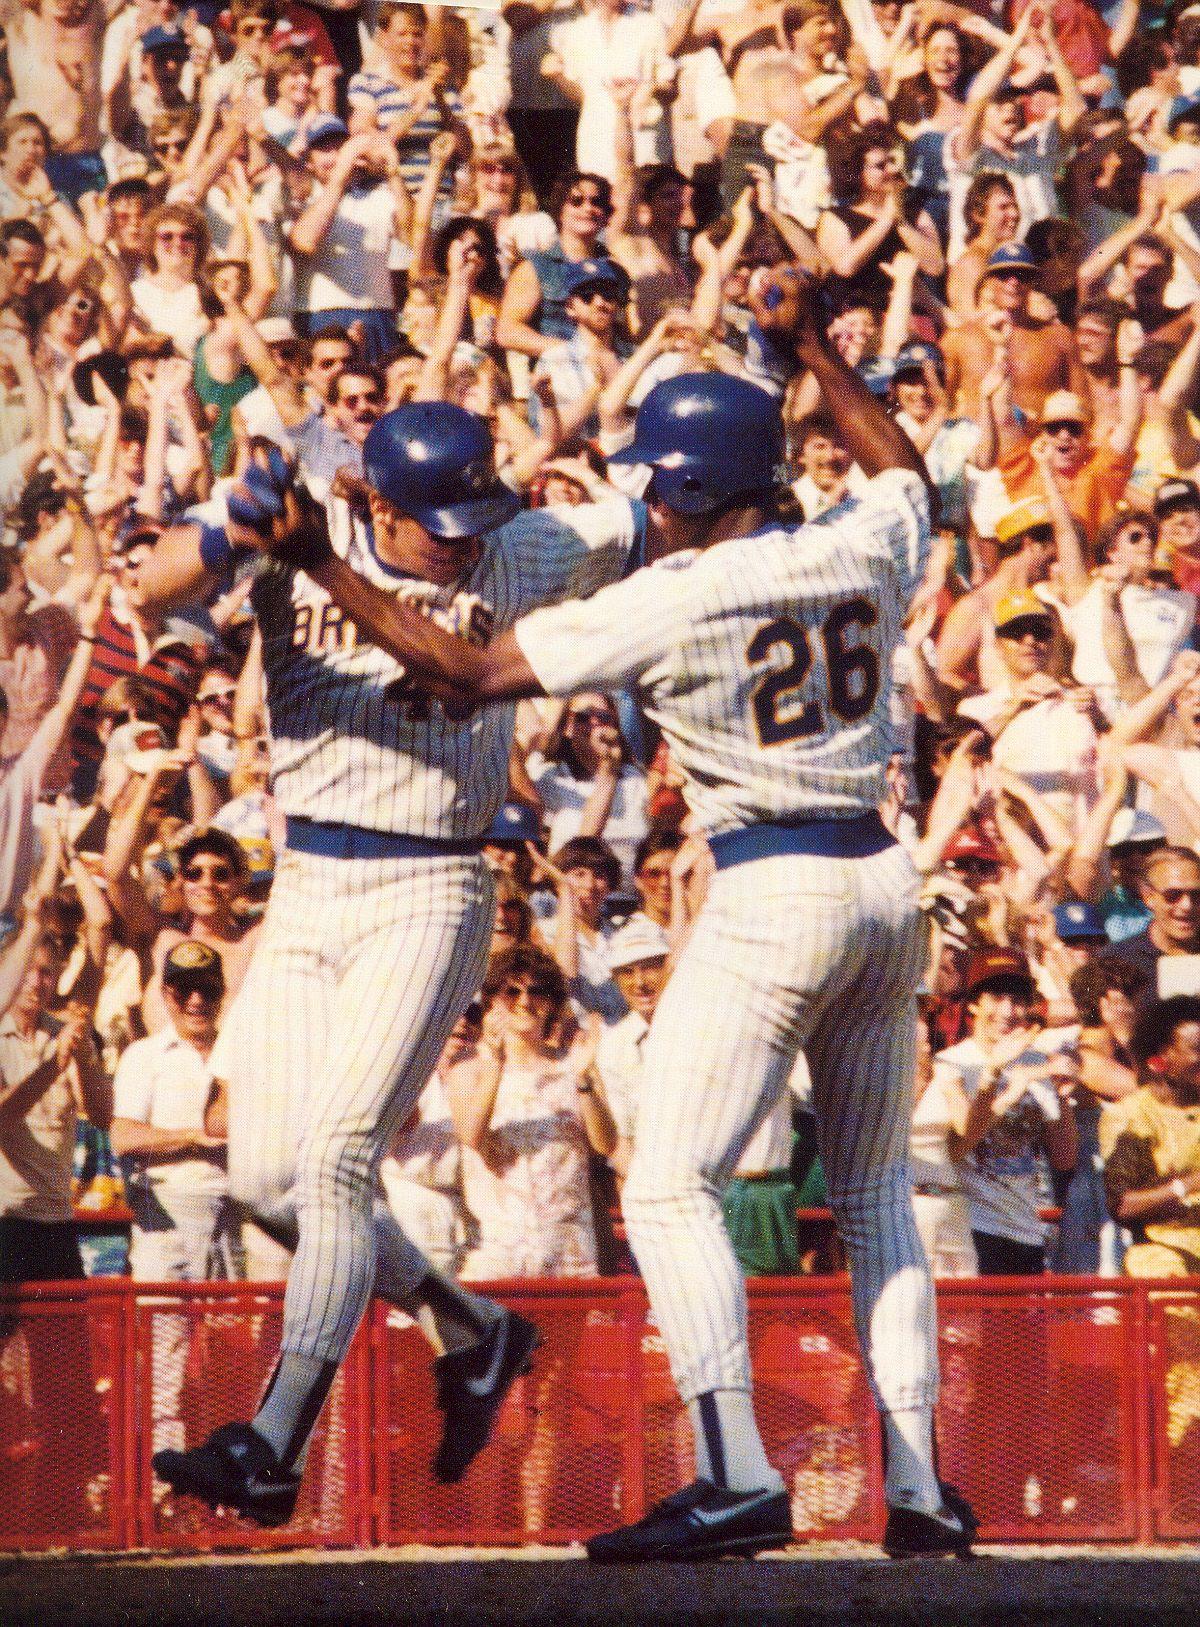 Throwback Thursday Easter Sunday, 1987. Rob Deer's 3run